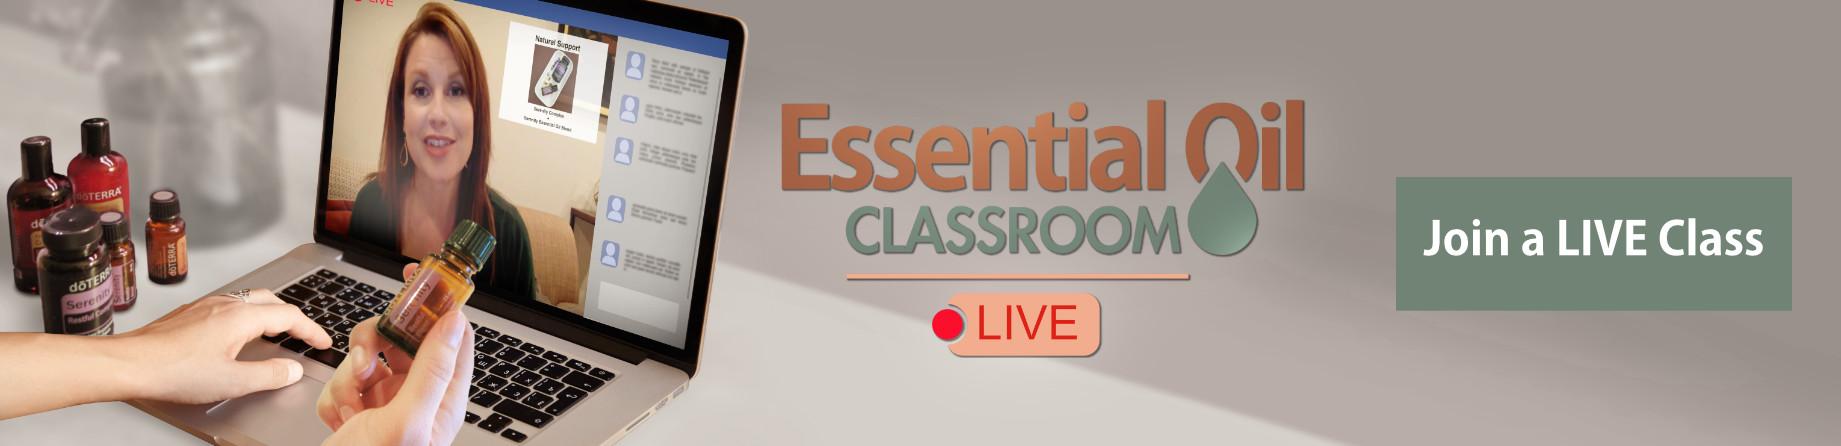 Essential Oil Live Classroom